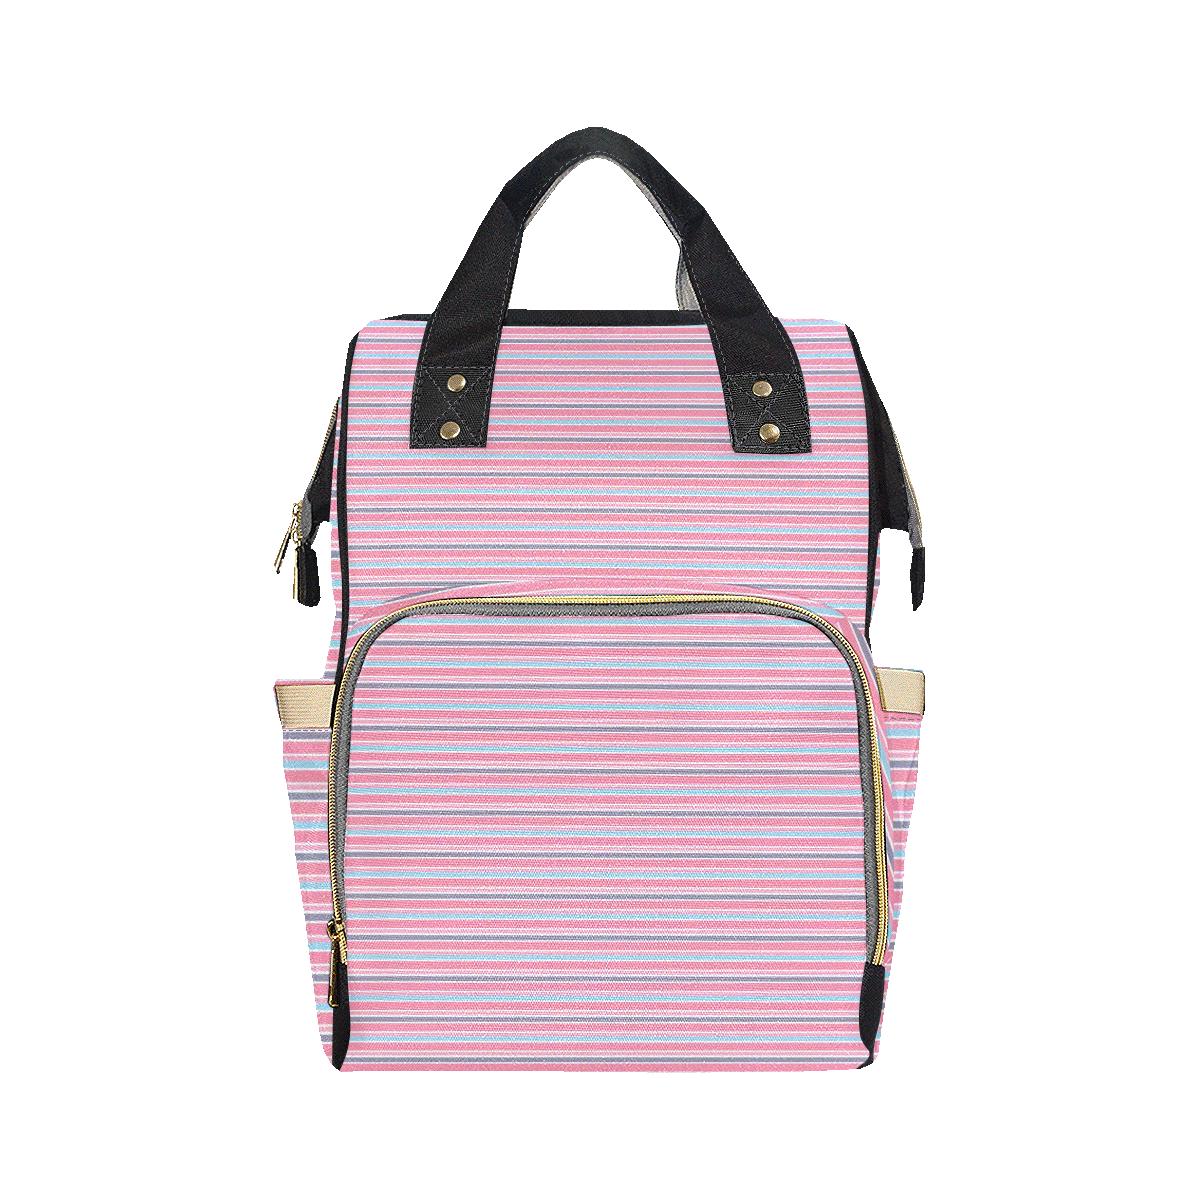 Pink Grey Turquoise Stripe Multi-Function Diaper Backpack/Diaper Bag (Model 1688)